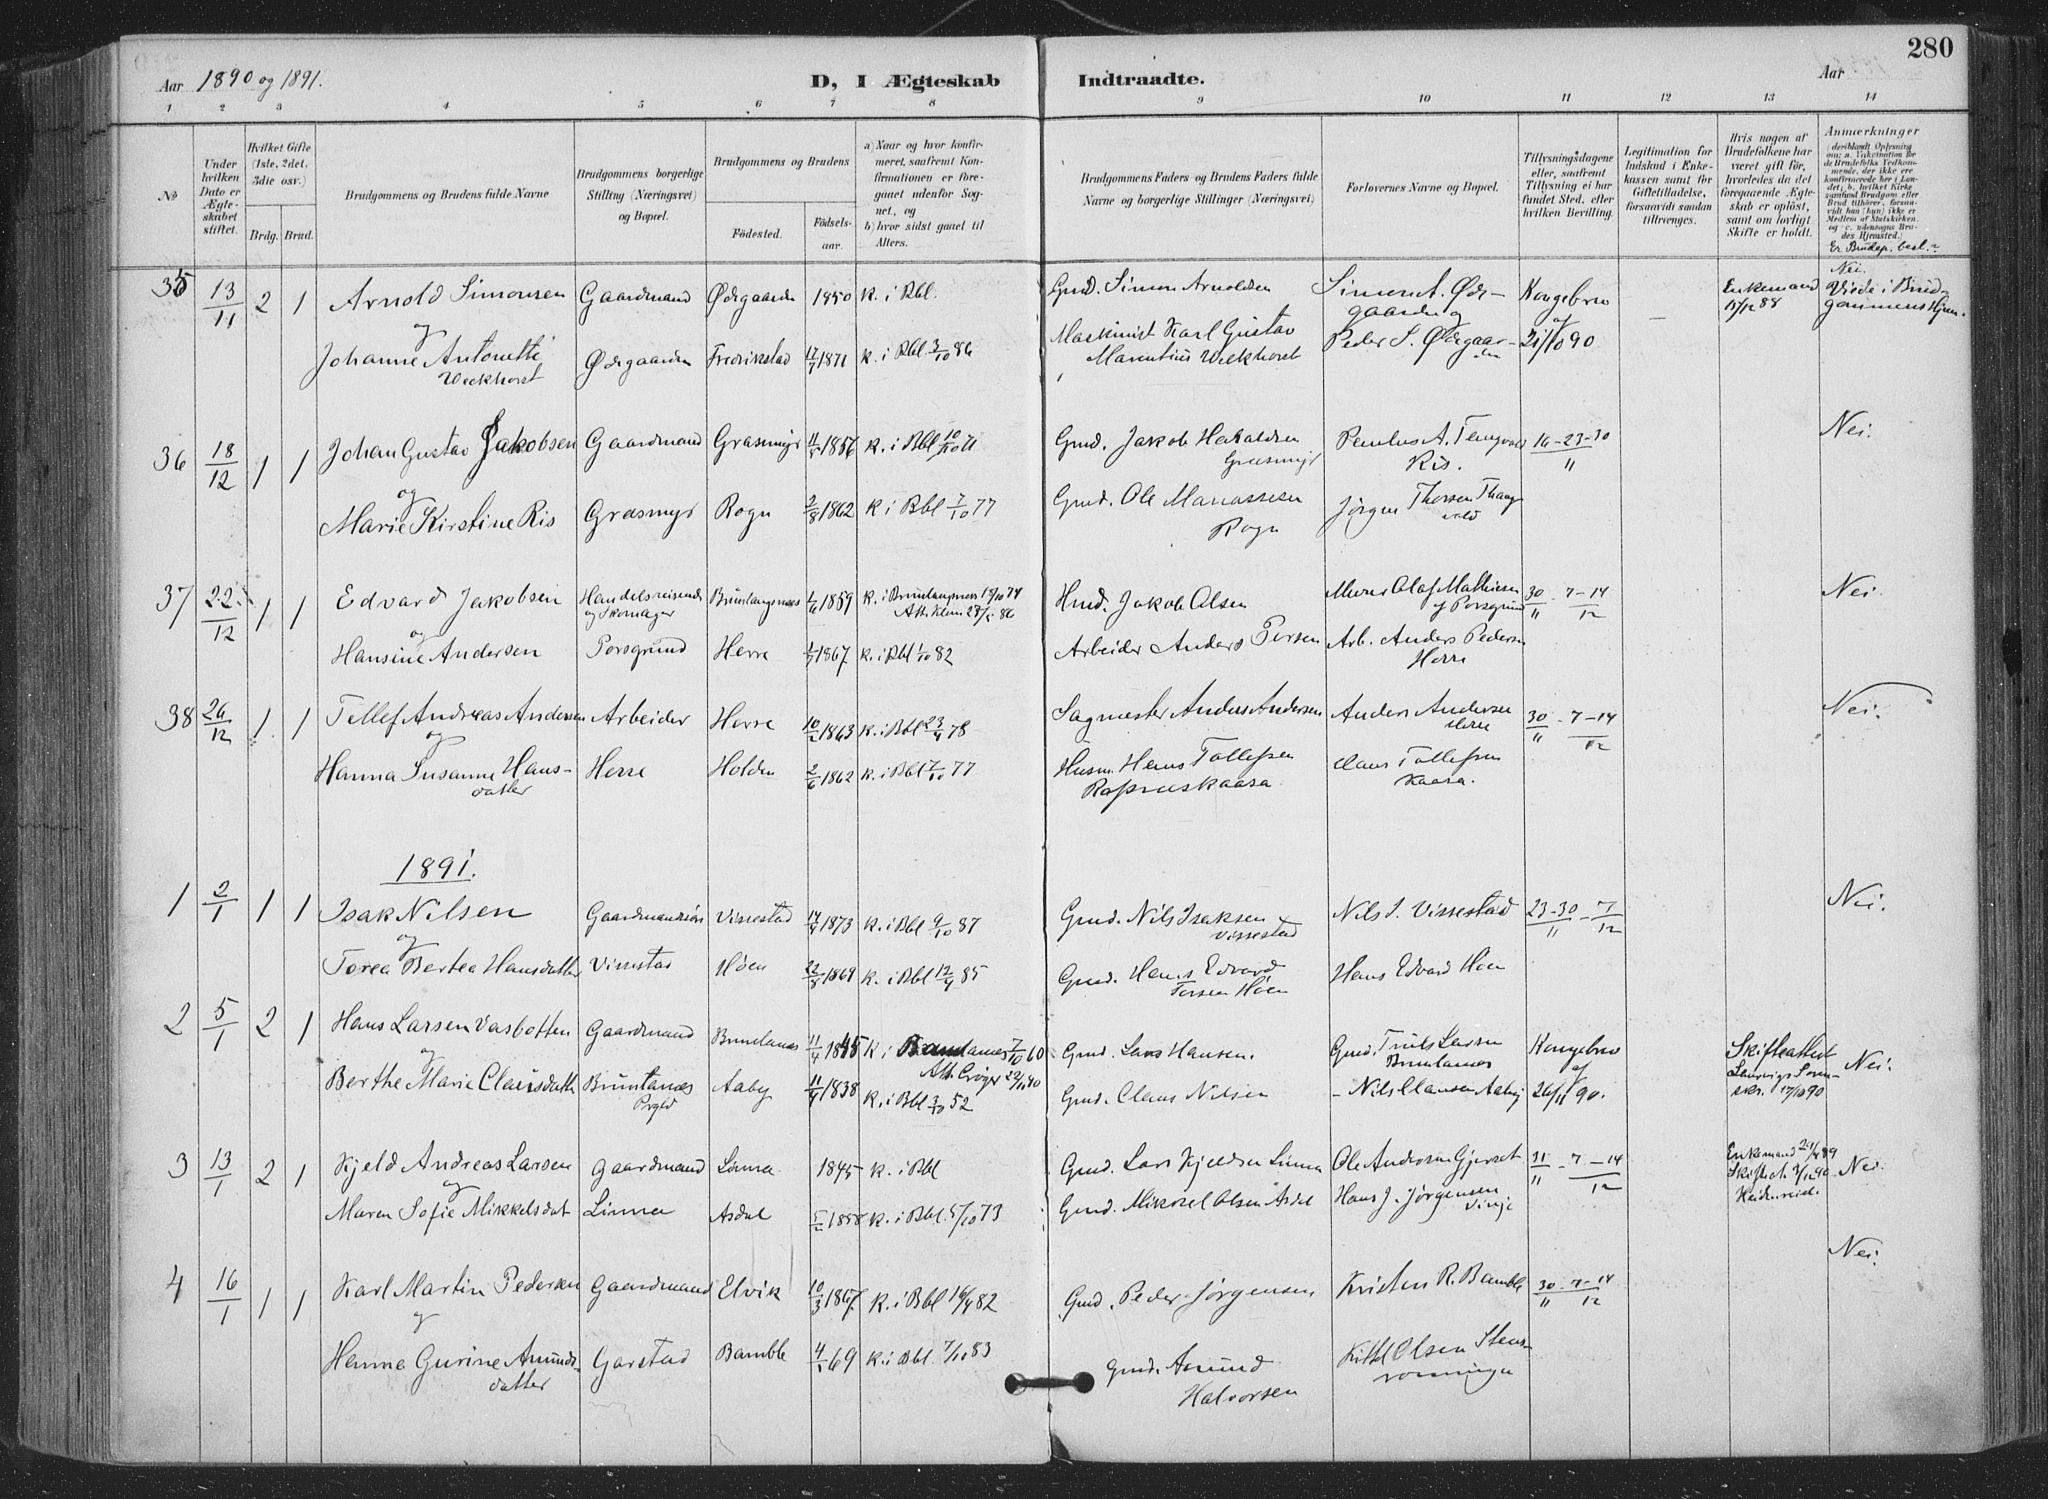 SAKO, Bamble kirkebøker, F/Fa/L0008: Ministerialbok nr. I 8, 1888-1900, s. 280